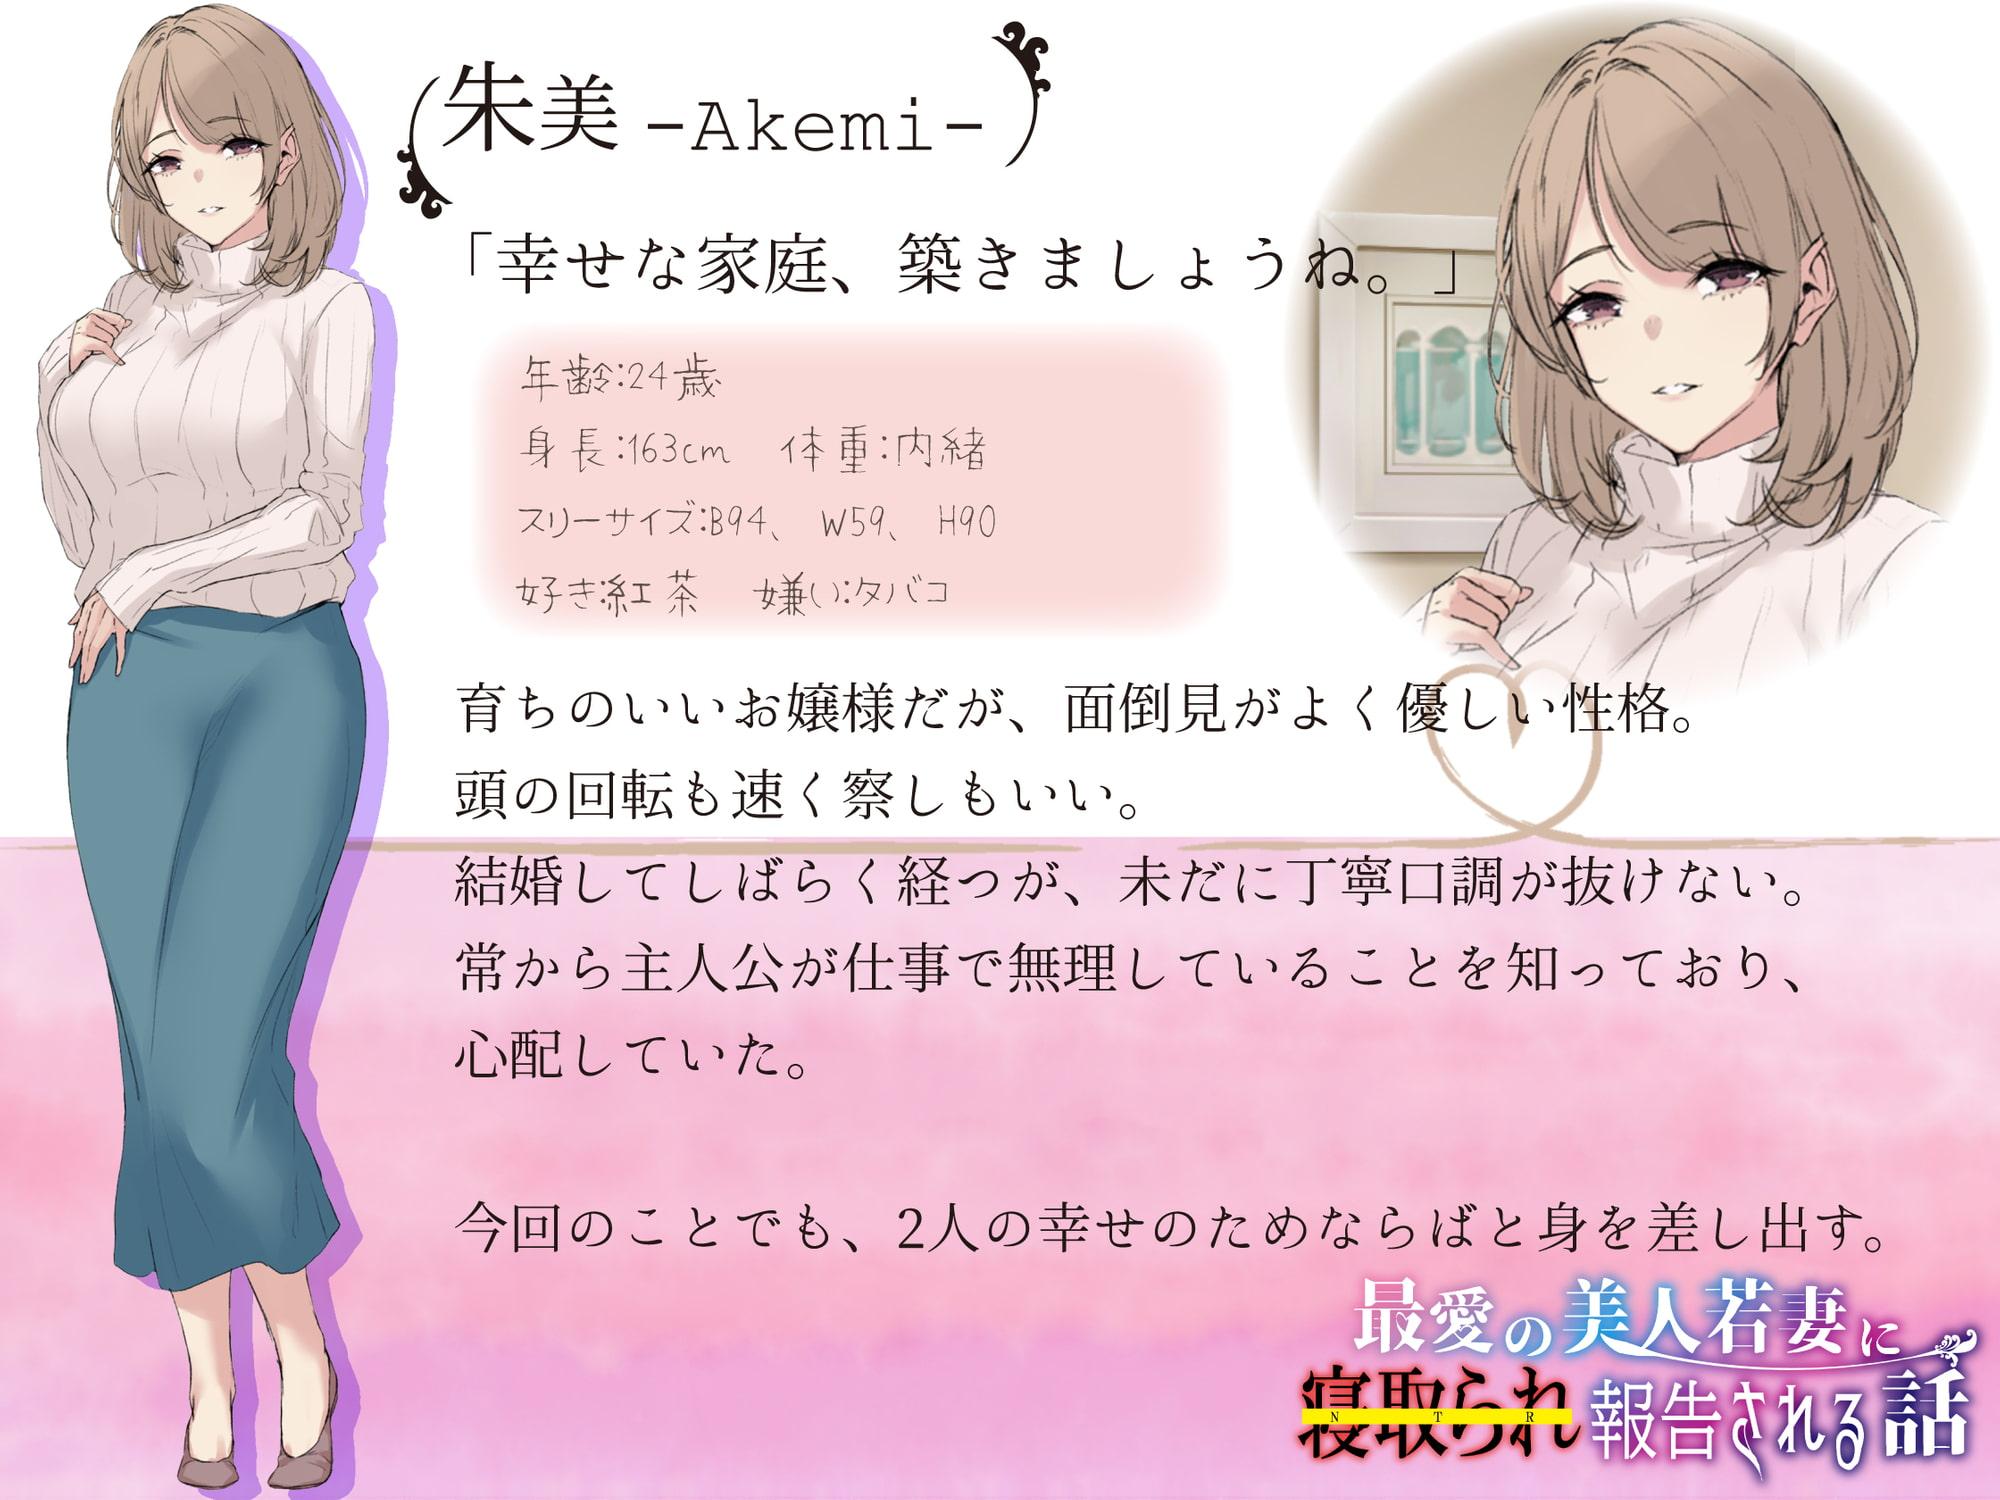 【KU100】最愛の美人若妻に寝取られ報告される話